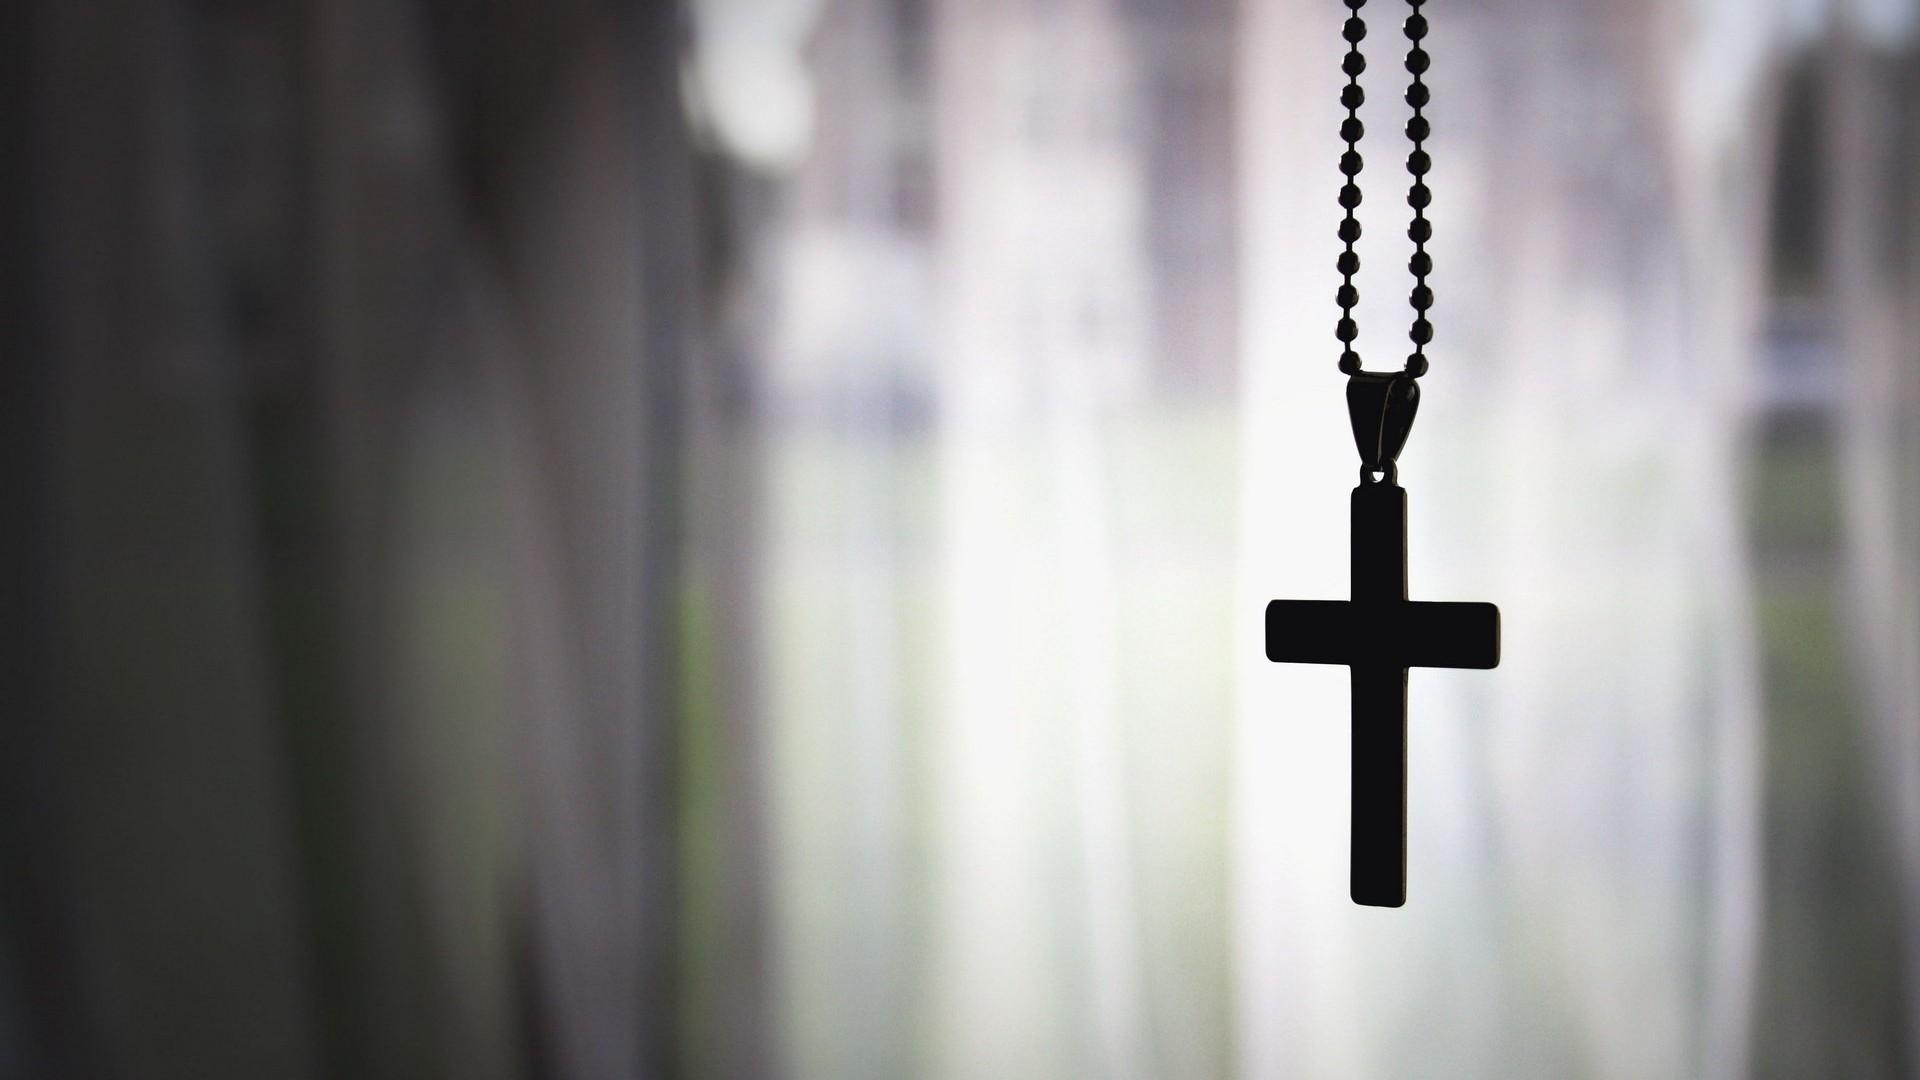 Religious   Cross Jesus Christ Savior God Wallpaper 1920x1080